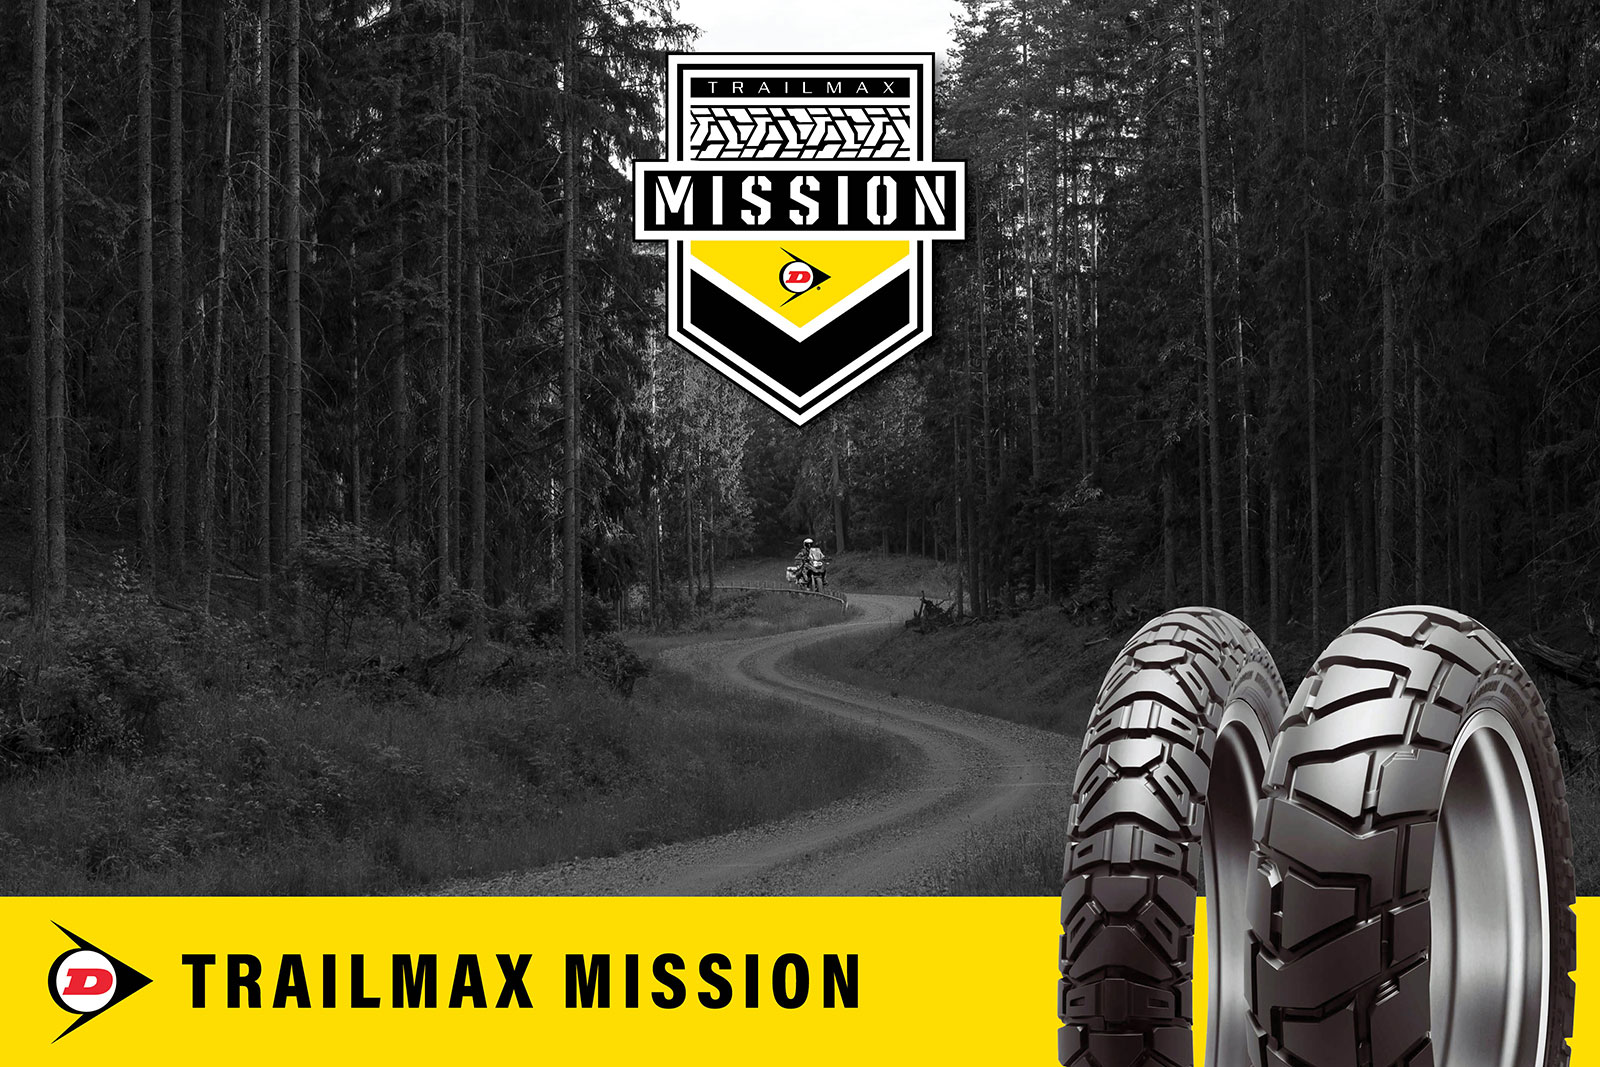 New Dunlop Trailmax Mission 50/50 tyre